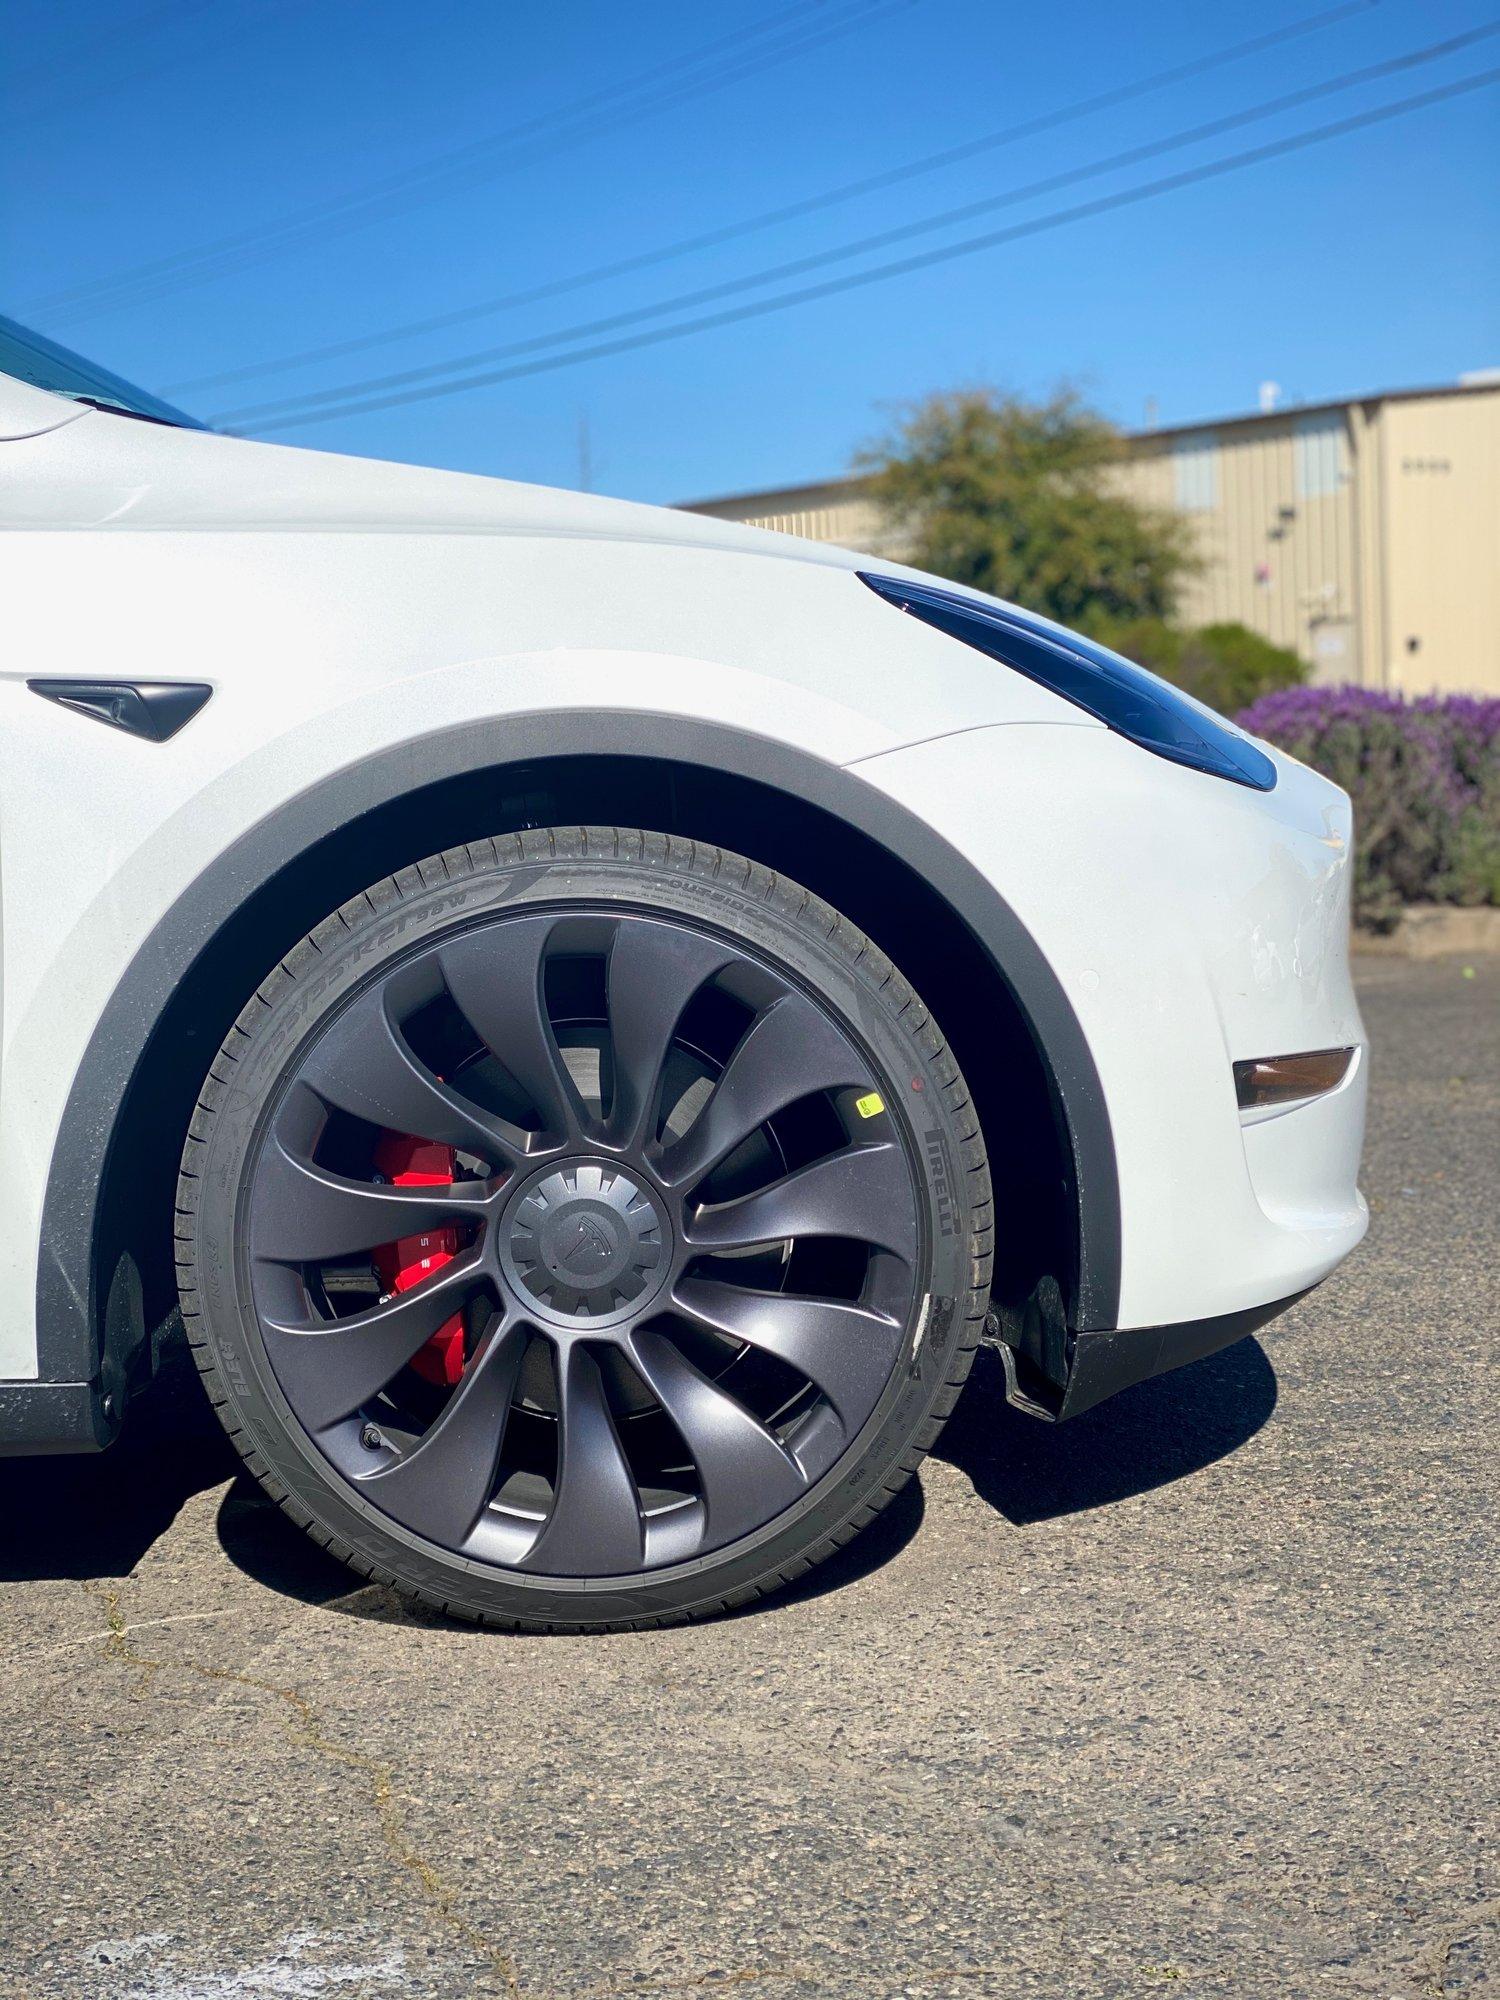 2020 Tesla Model Y Pearl White Multi-Coat  (Appearance Solutions-Sacramento,CA)~9.JPG